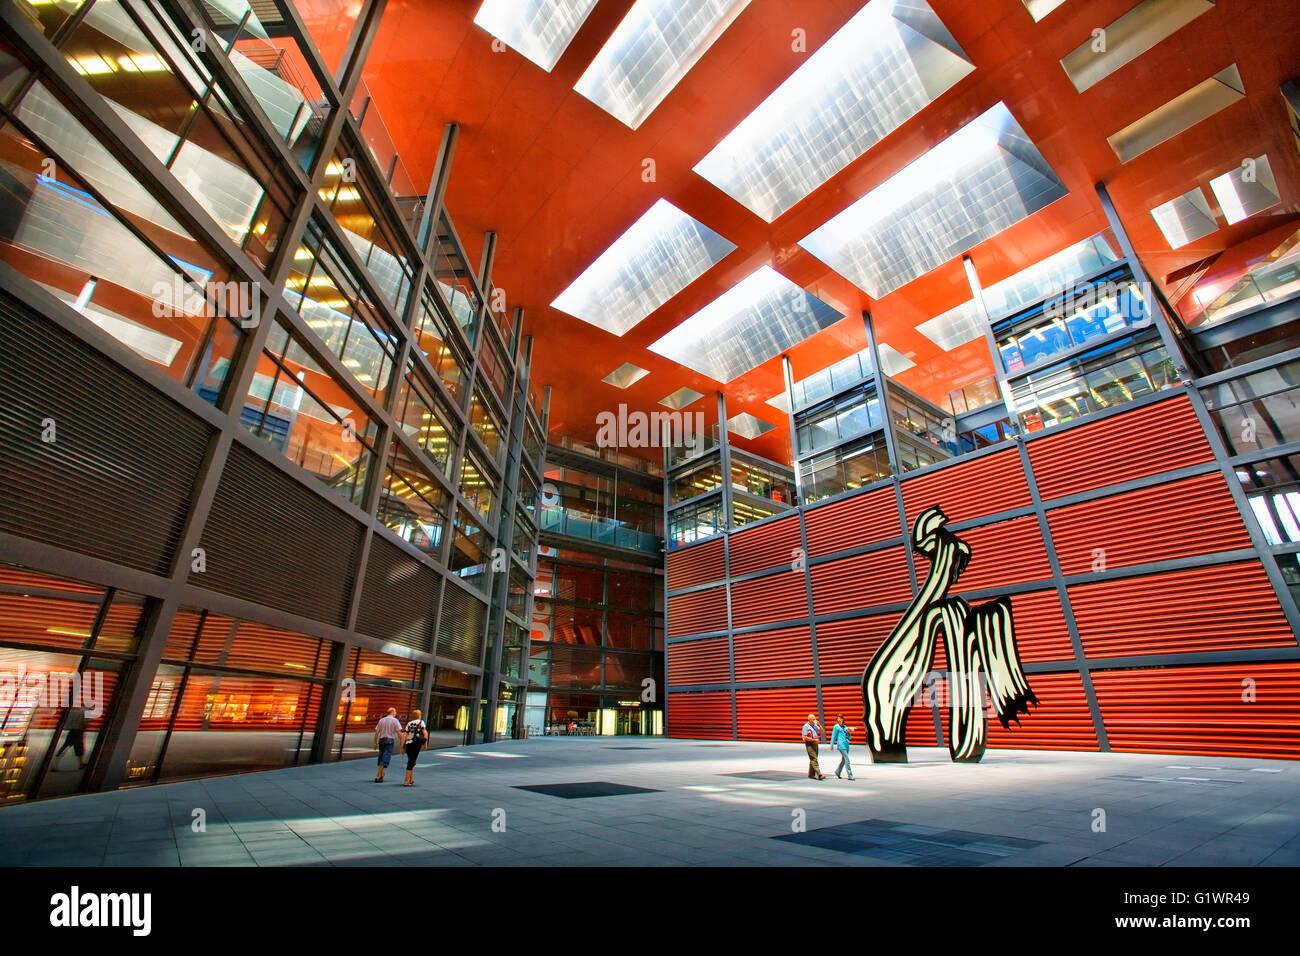 The Centro de Arte Reina Sofia in Madrid by Jean Nouvel - Stock Image